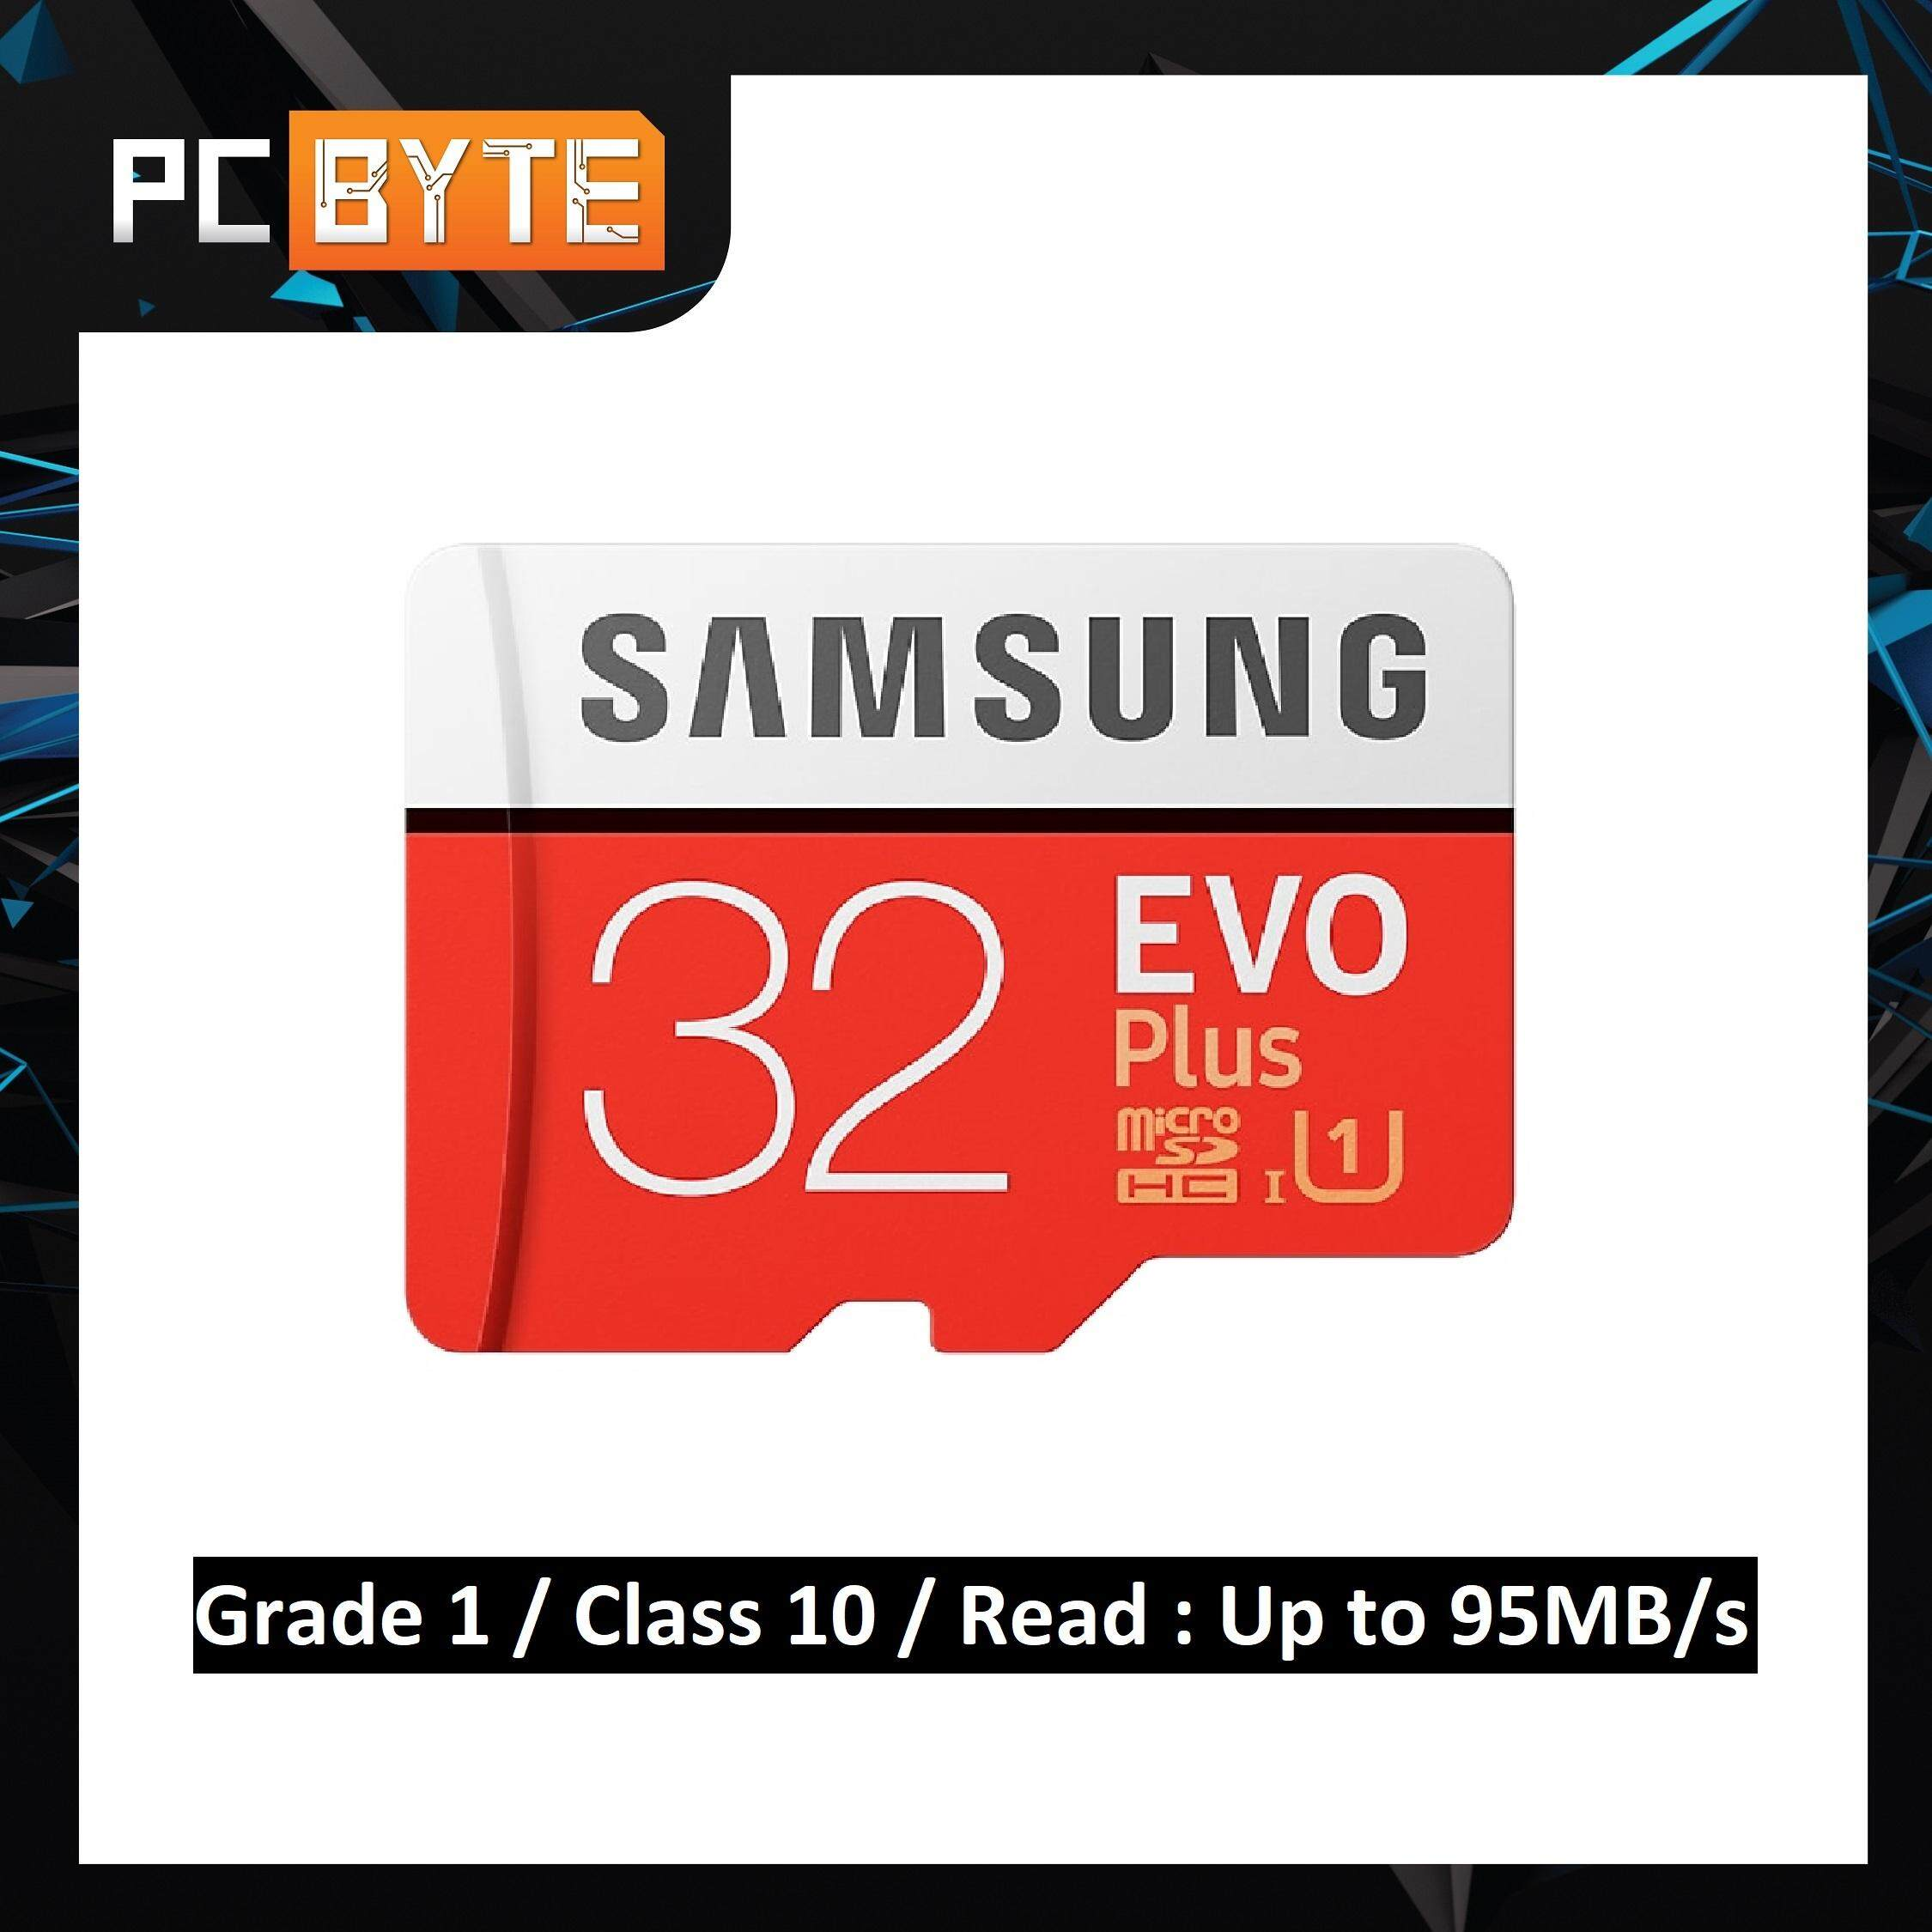 c8c12ddd7 (100% Original   2018 Edition)Samsung EVO Plus 32GB MicroSD Class 10 95MB